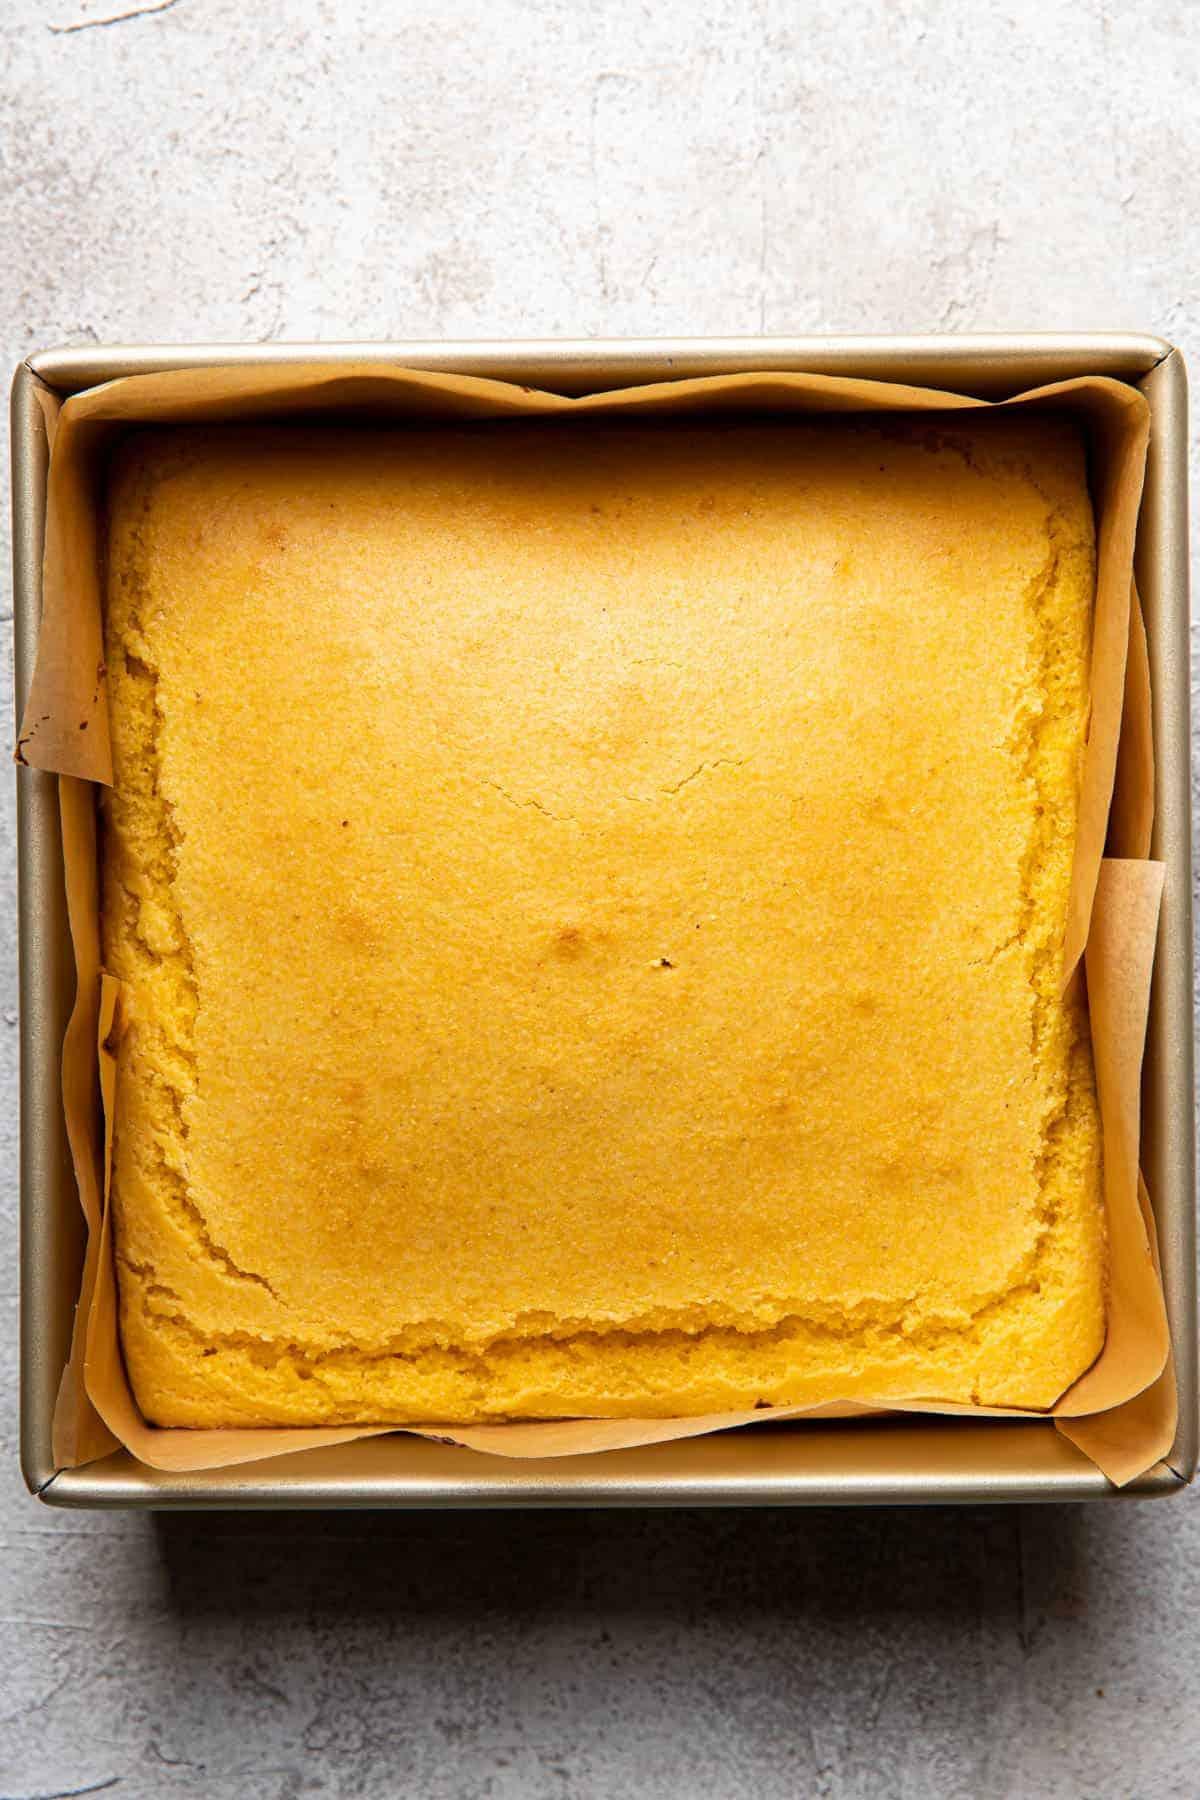 buttermilk honey cornbread batter in a baking pan.